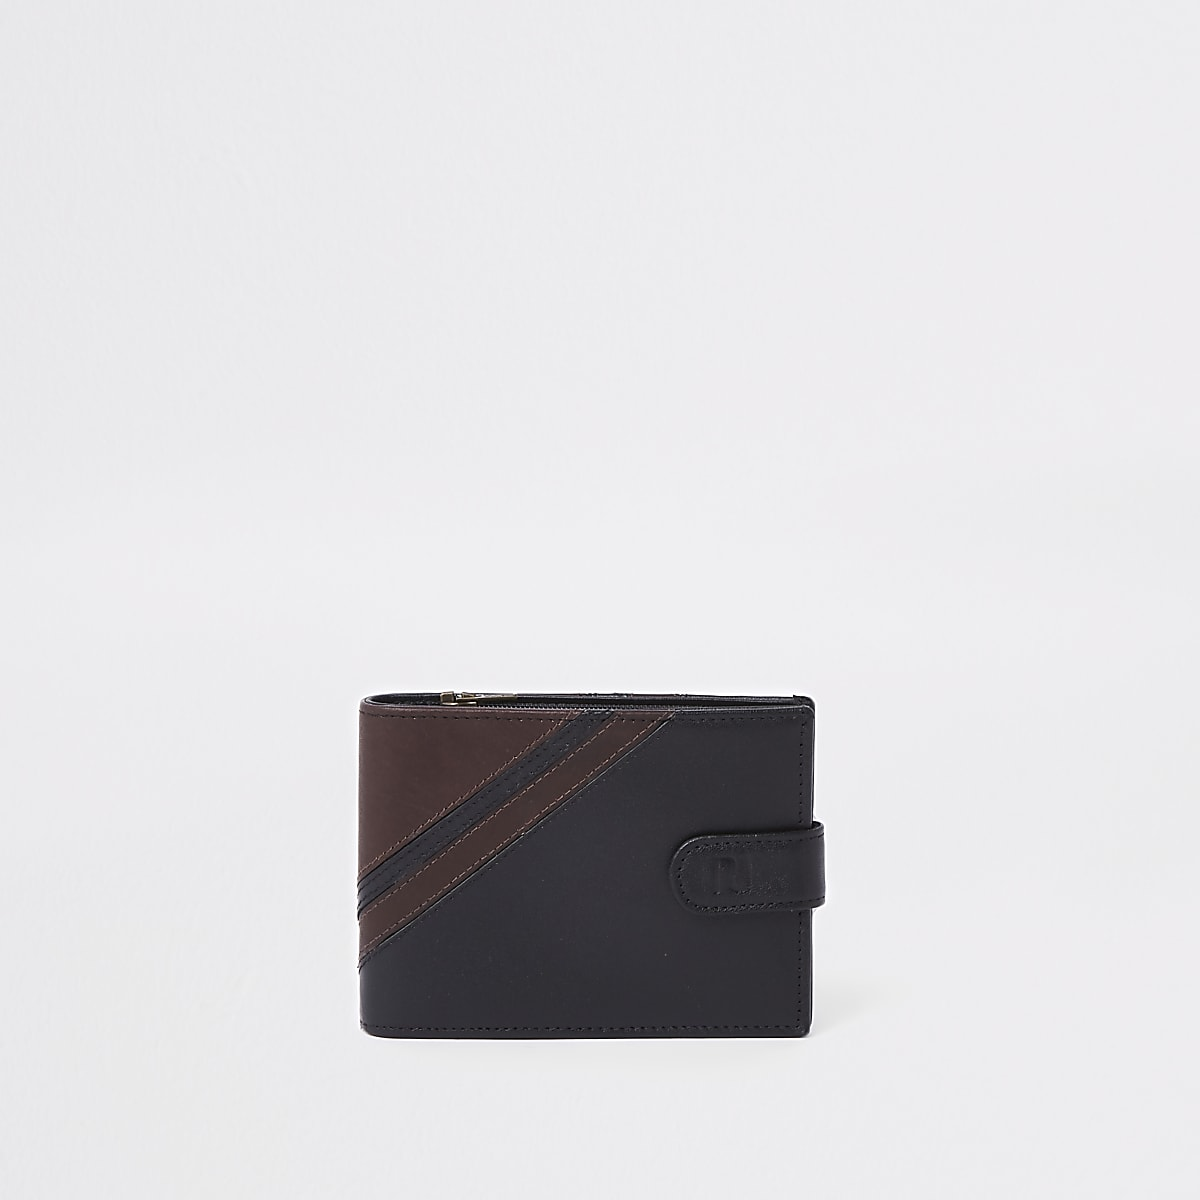 Portefeuille rayé en cuir noir